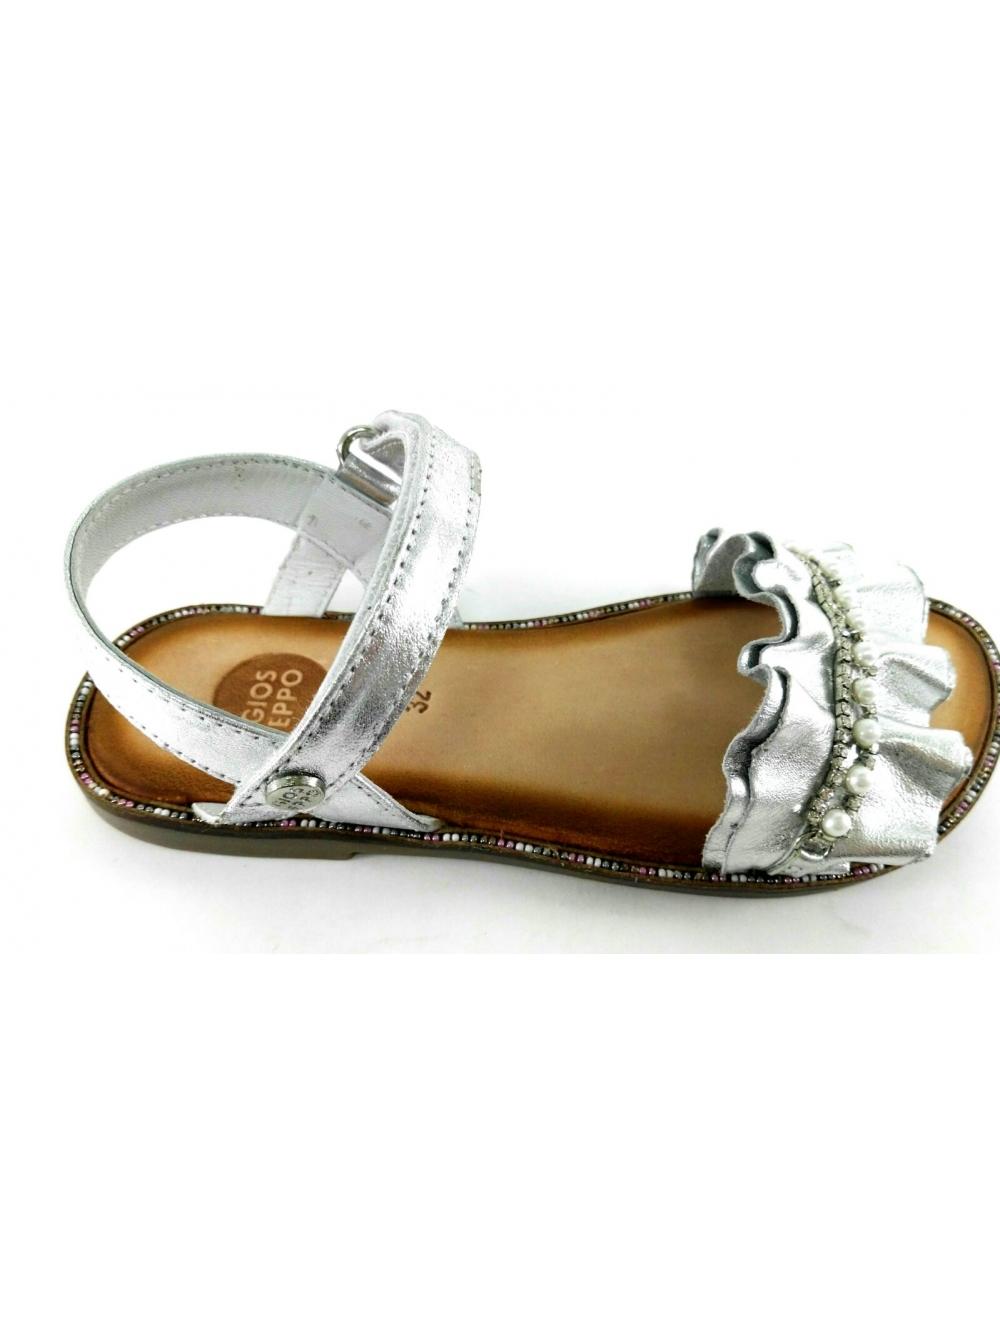 Tozwxikulp Sandalia Calzados Grau Piel Plata Perlas IgYb7vf6ym